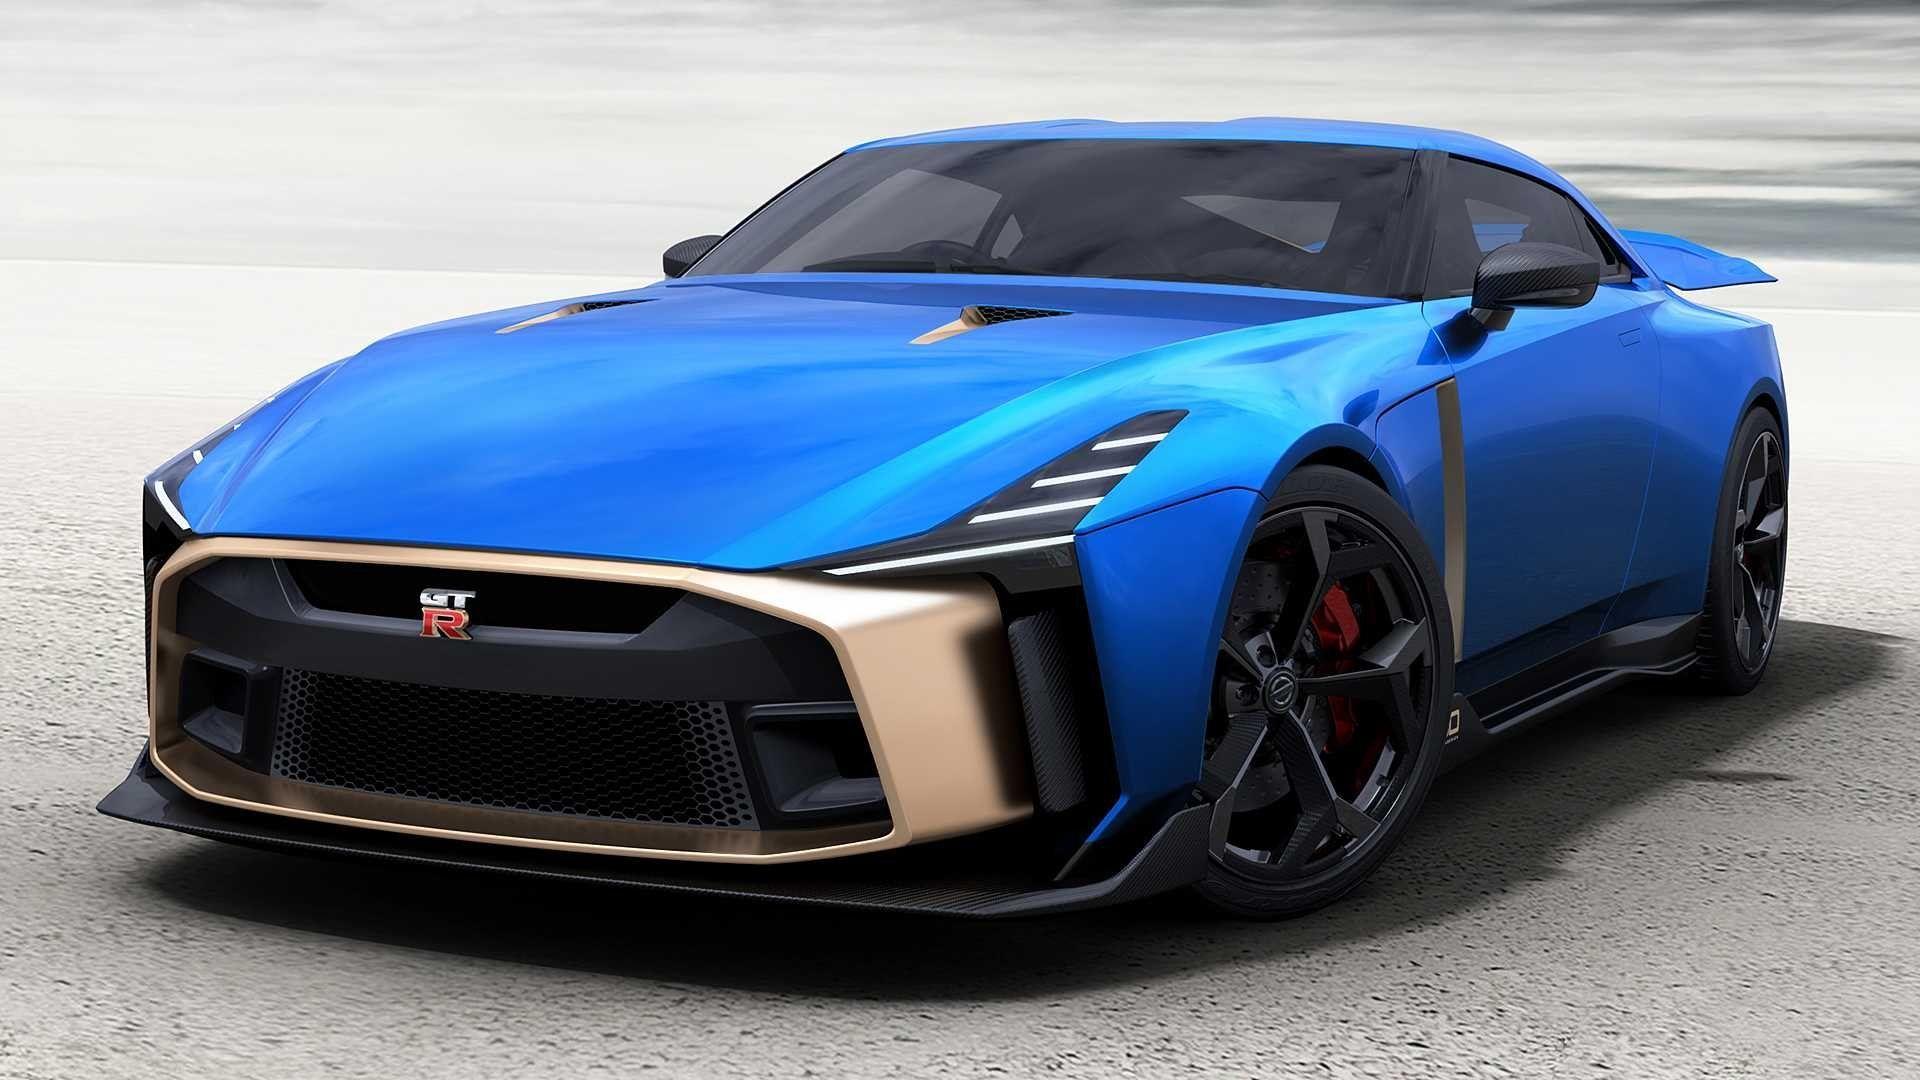 2020 Nissan Gtr Nismo Hybrid Speed Test